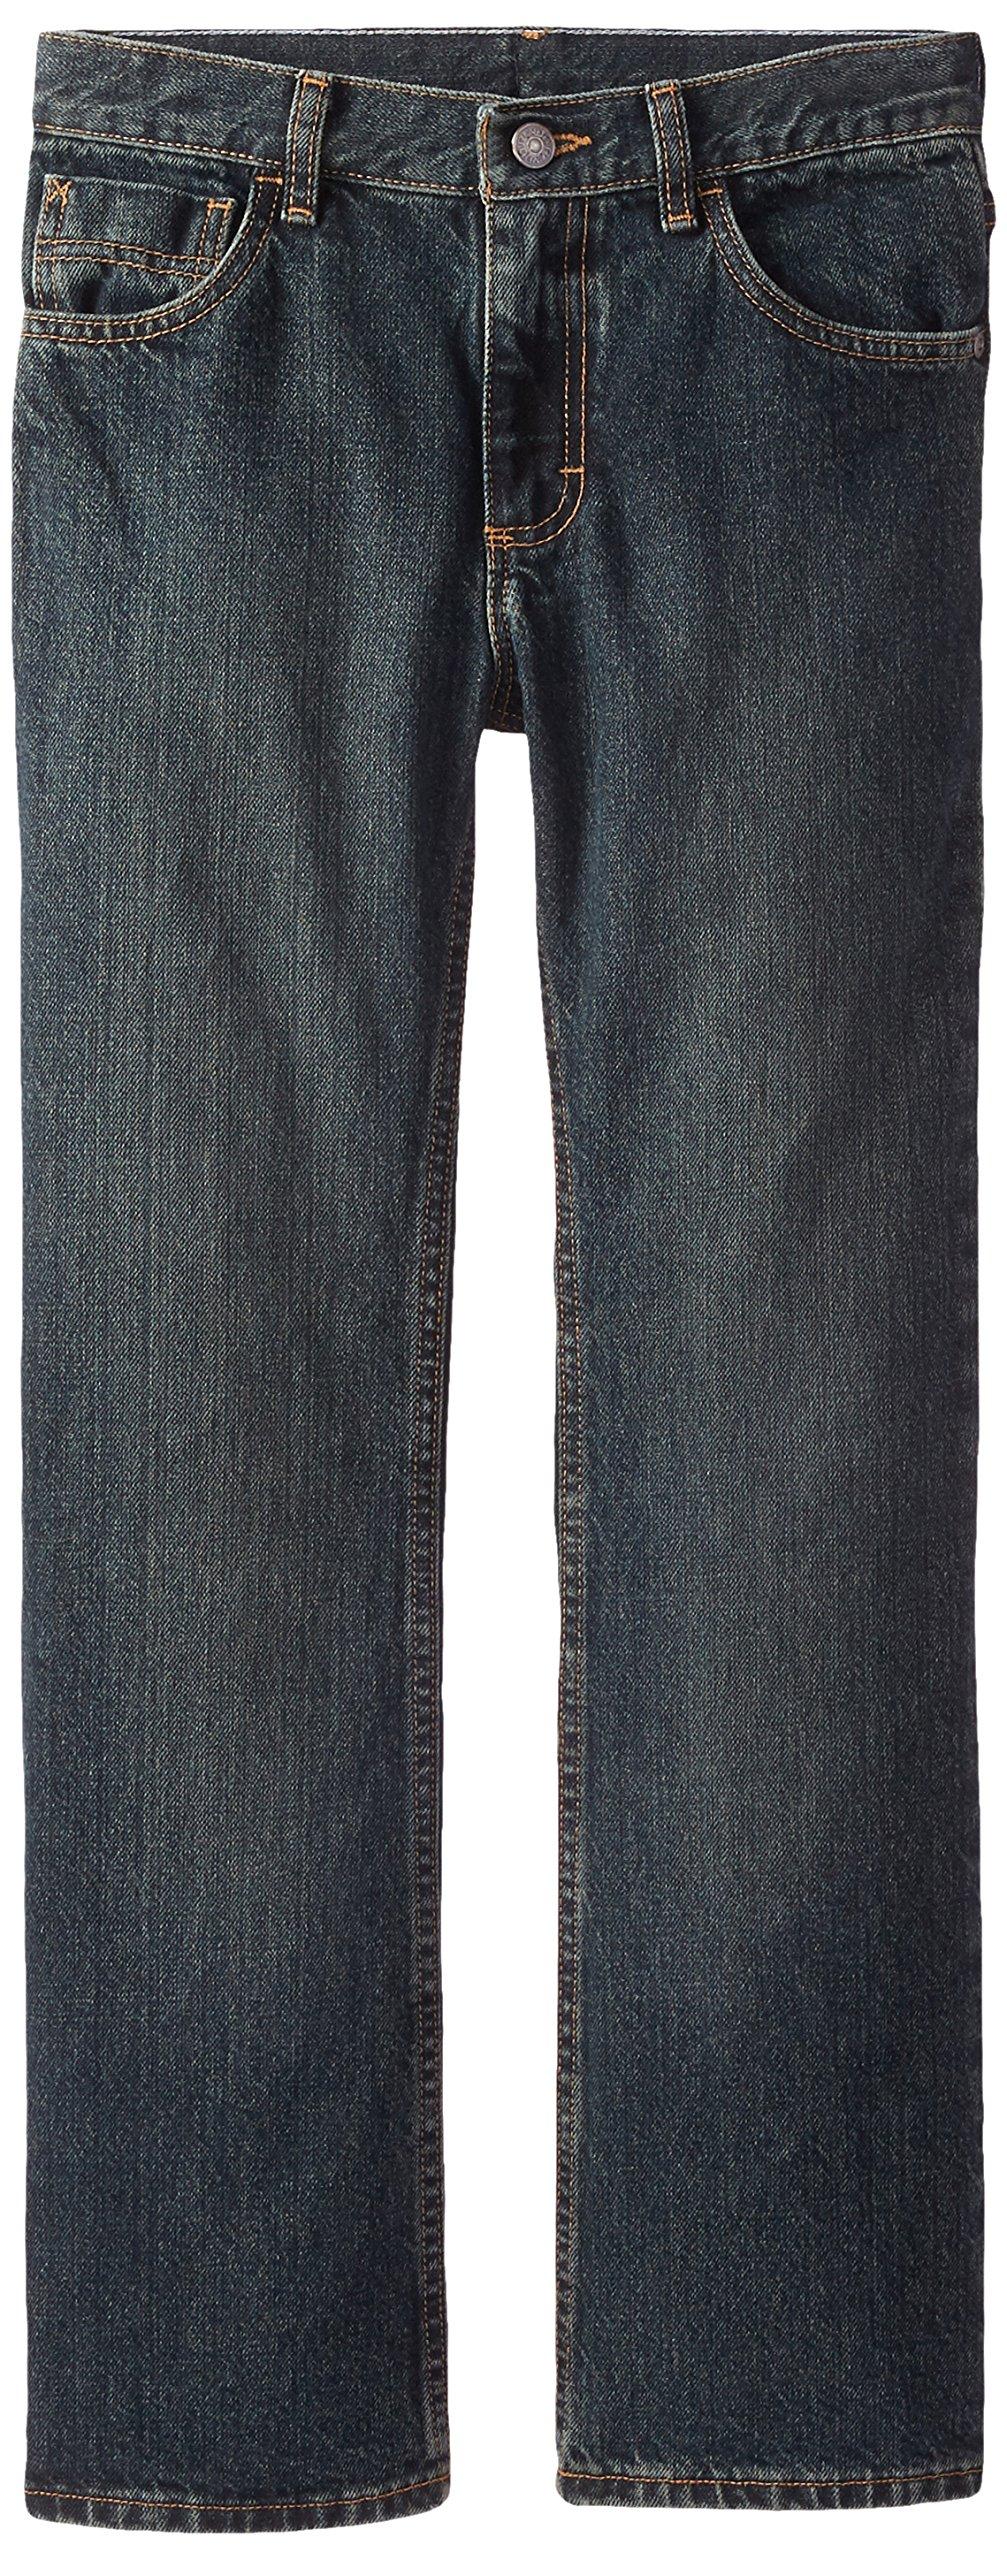 Wrangler Big Boys' Authentics Boot Cut Jeans, Forest Denim, 8 by Wrangler (Image #1)